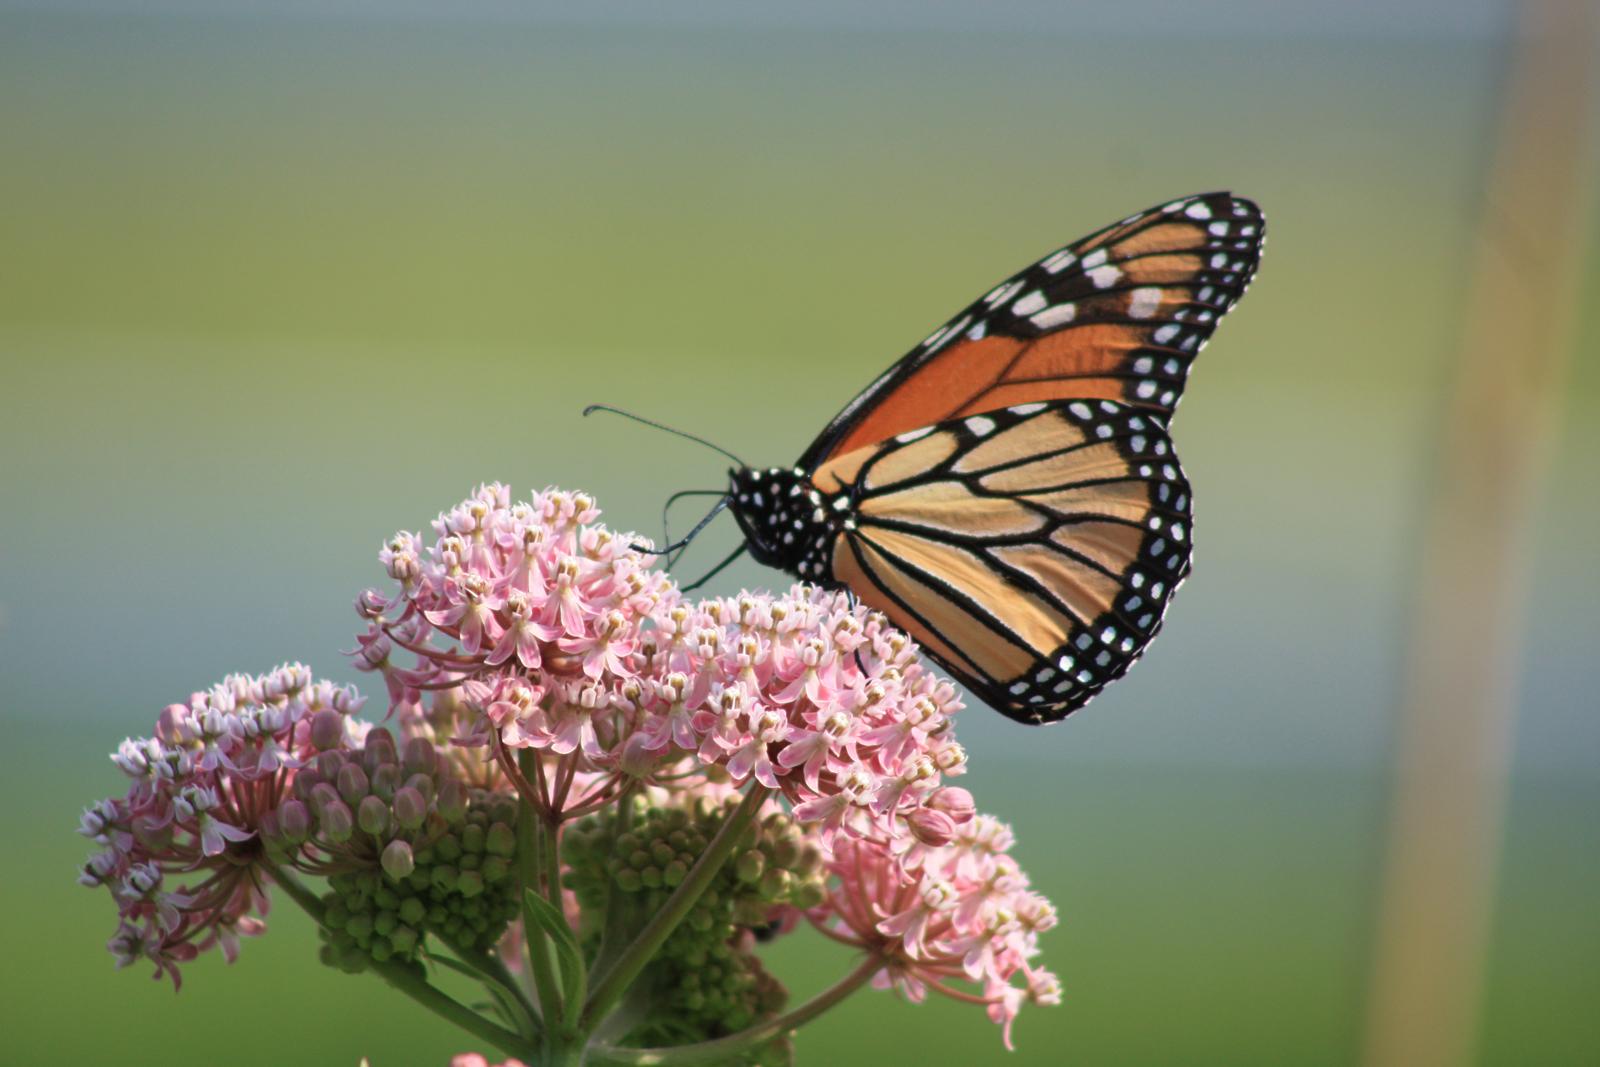 Monarch on Milkweed by Marie Longo